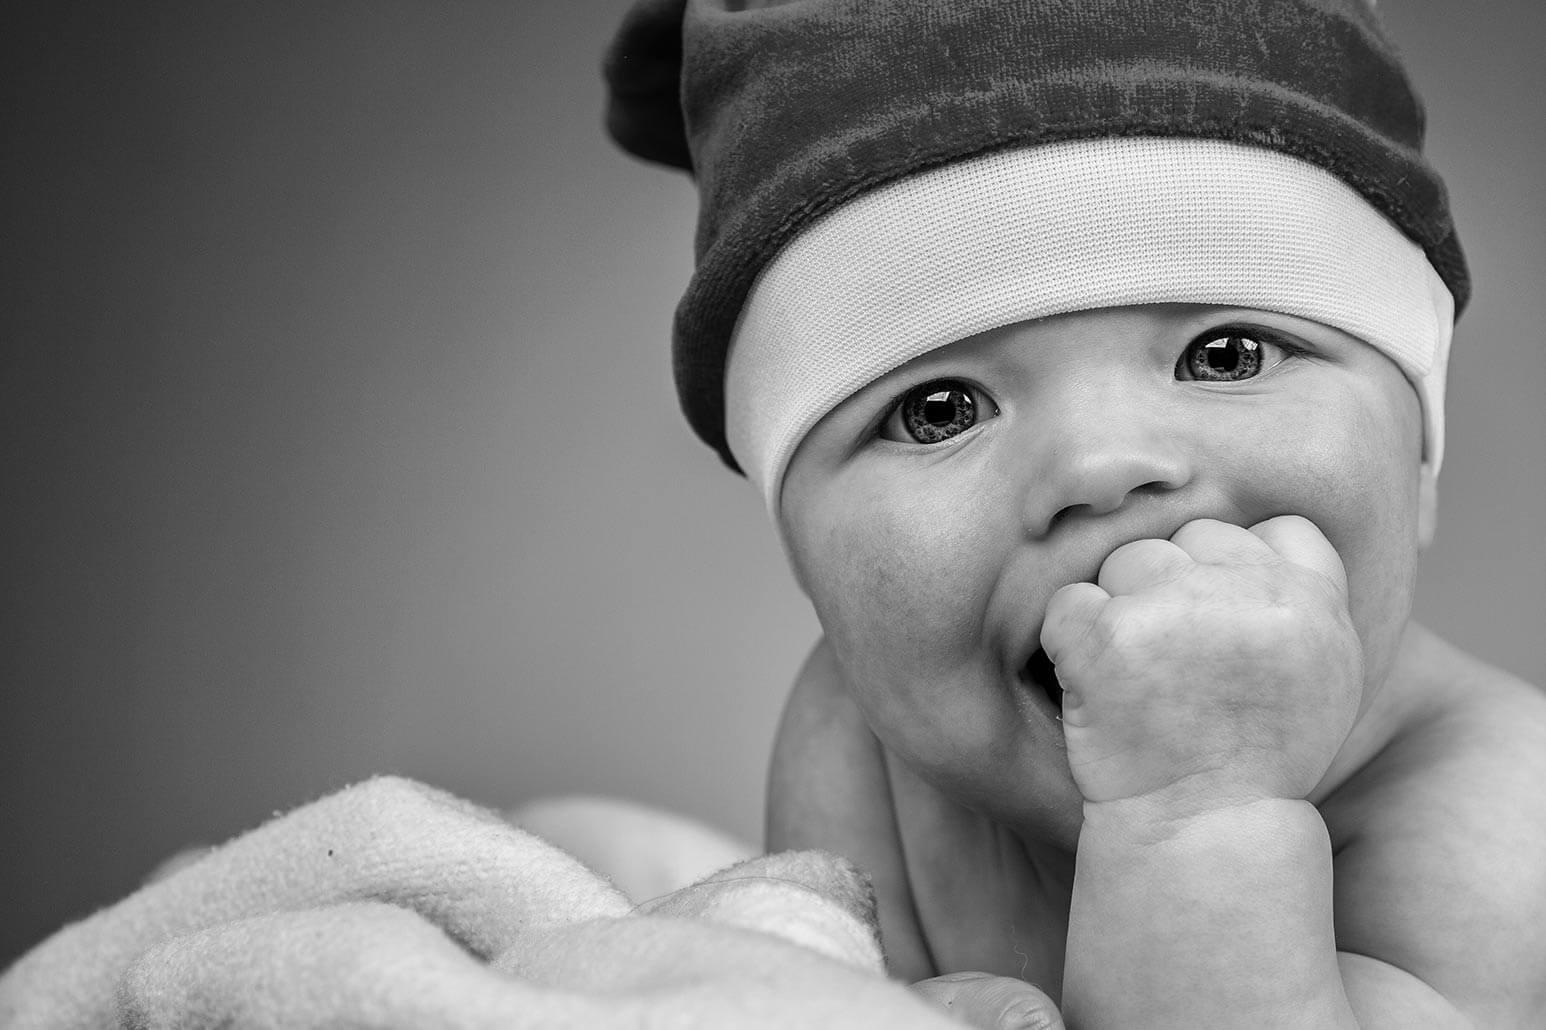 Fotoshooting für Kinderfotos